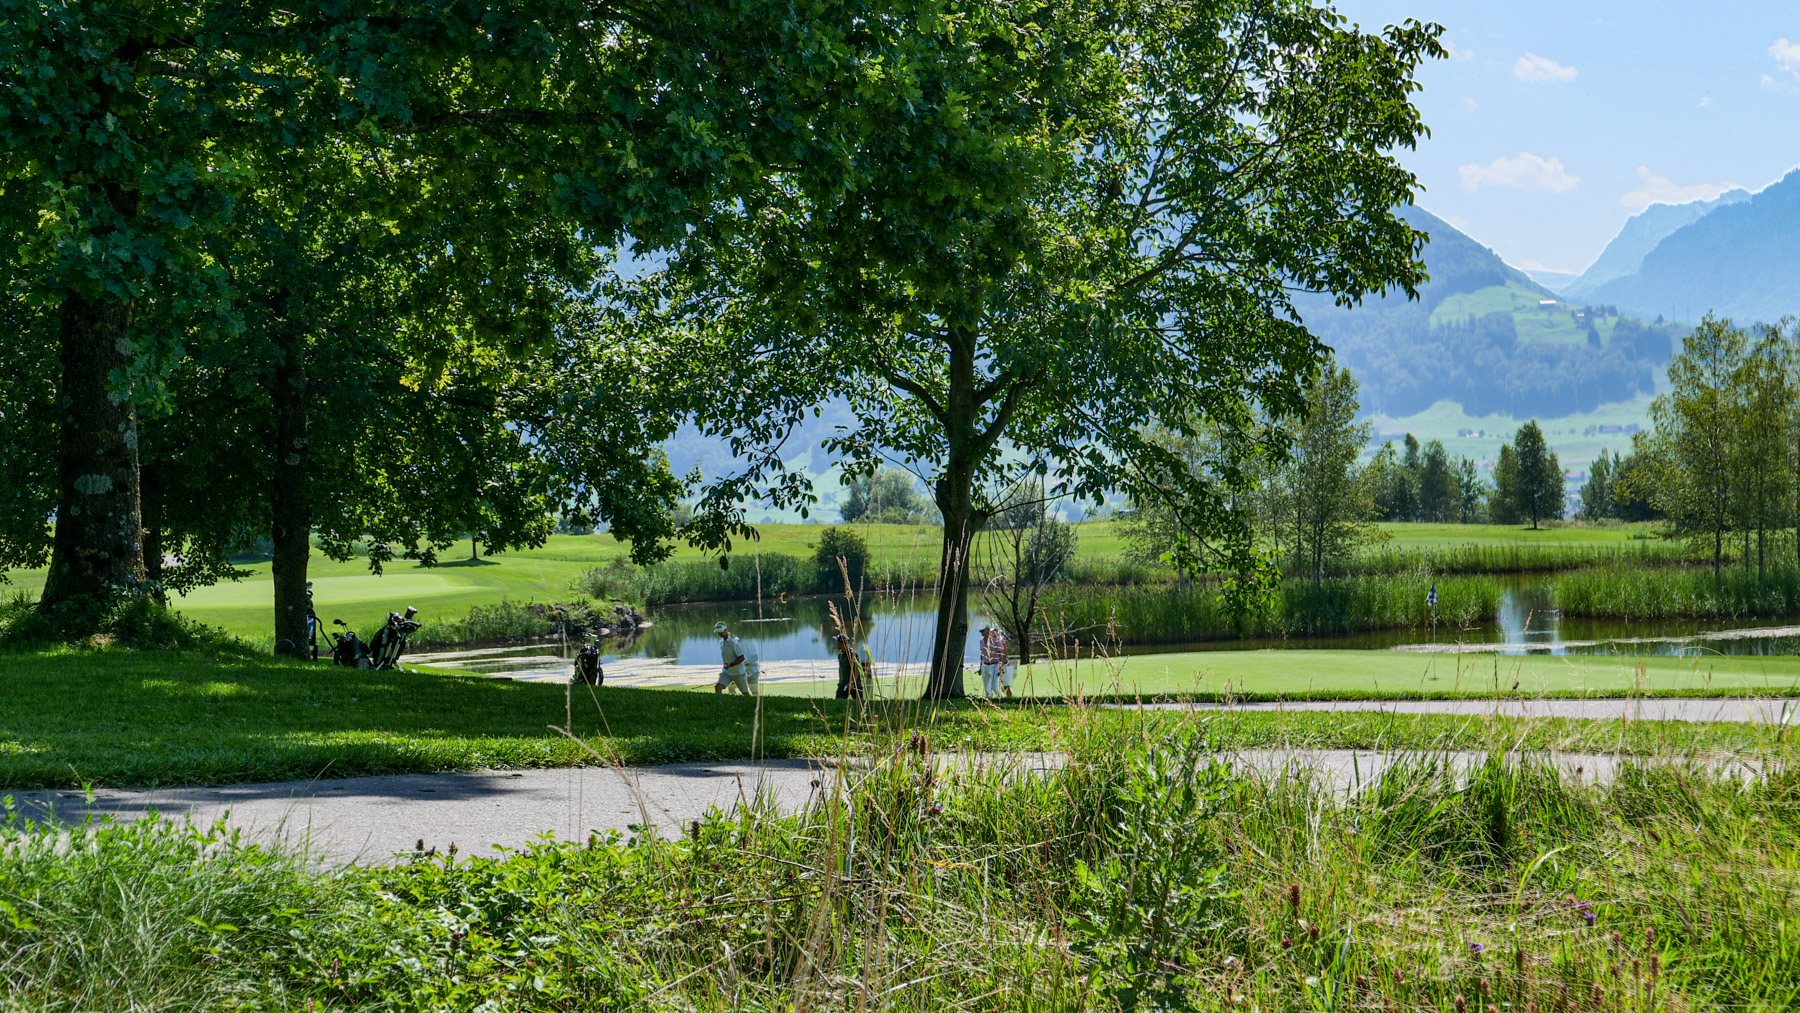 12a Golfplatz